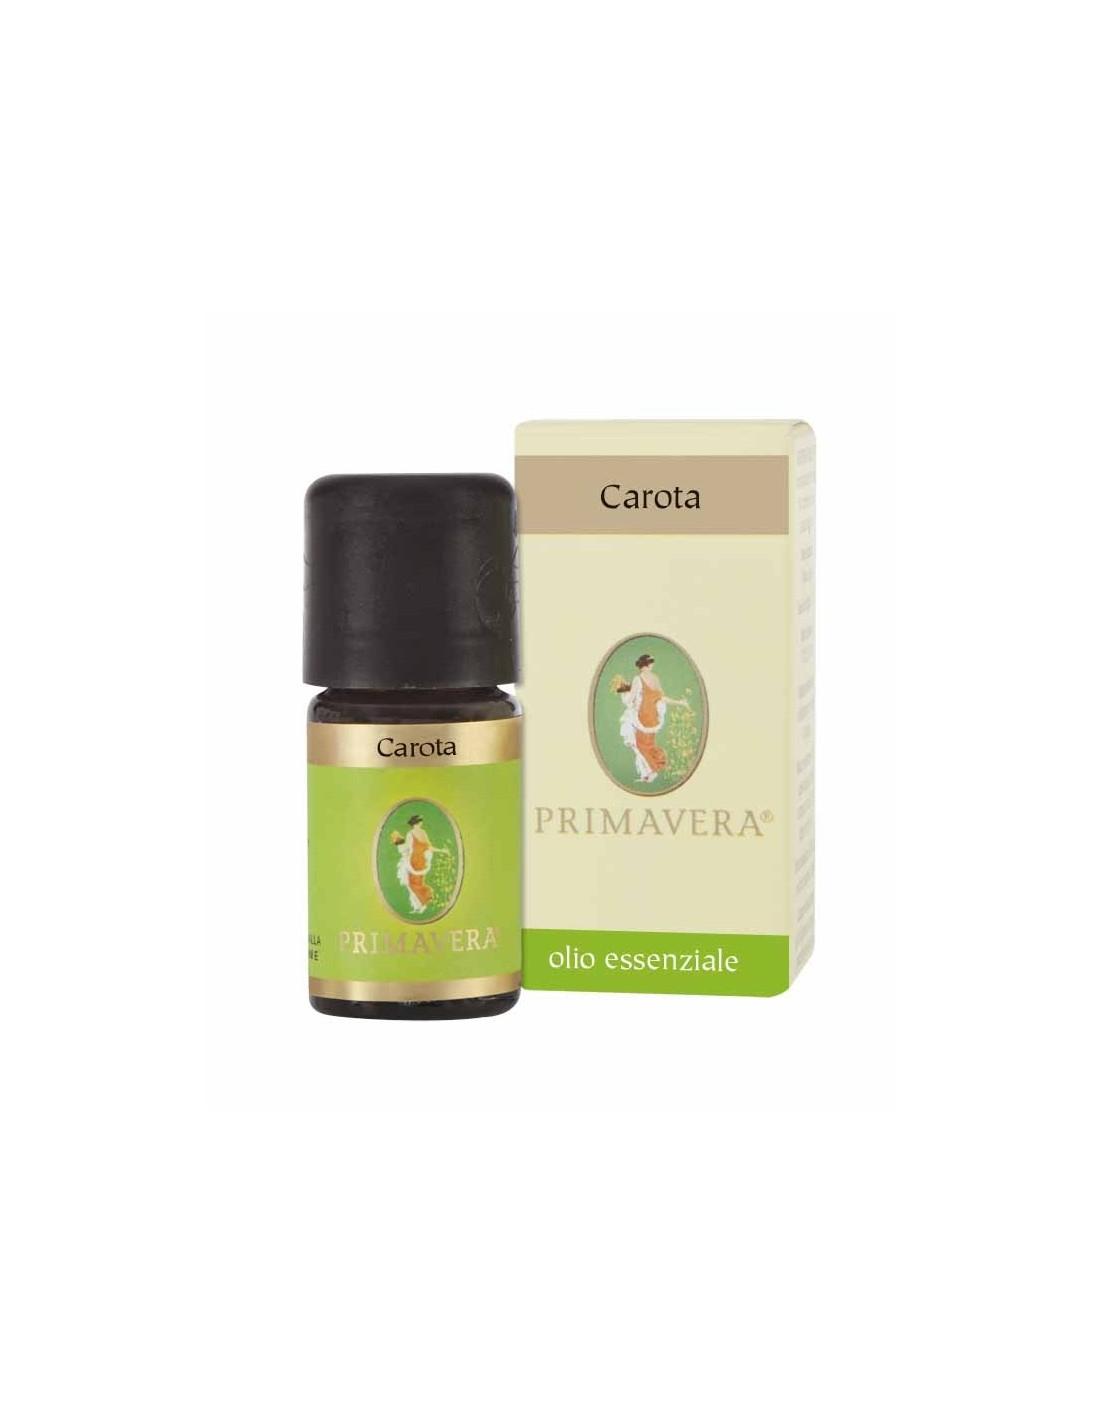 Carota Olio Essenziale 5 ml